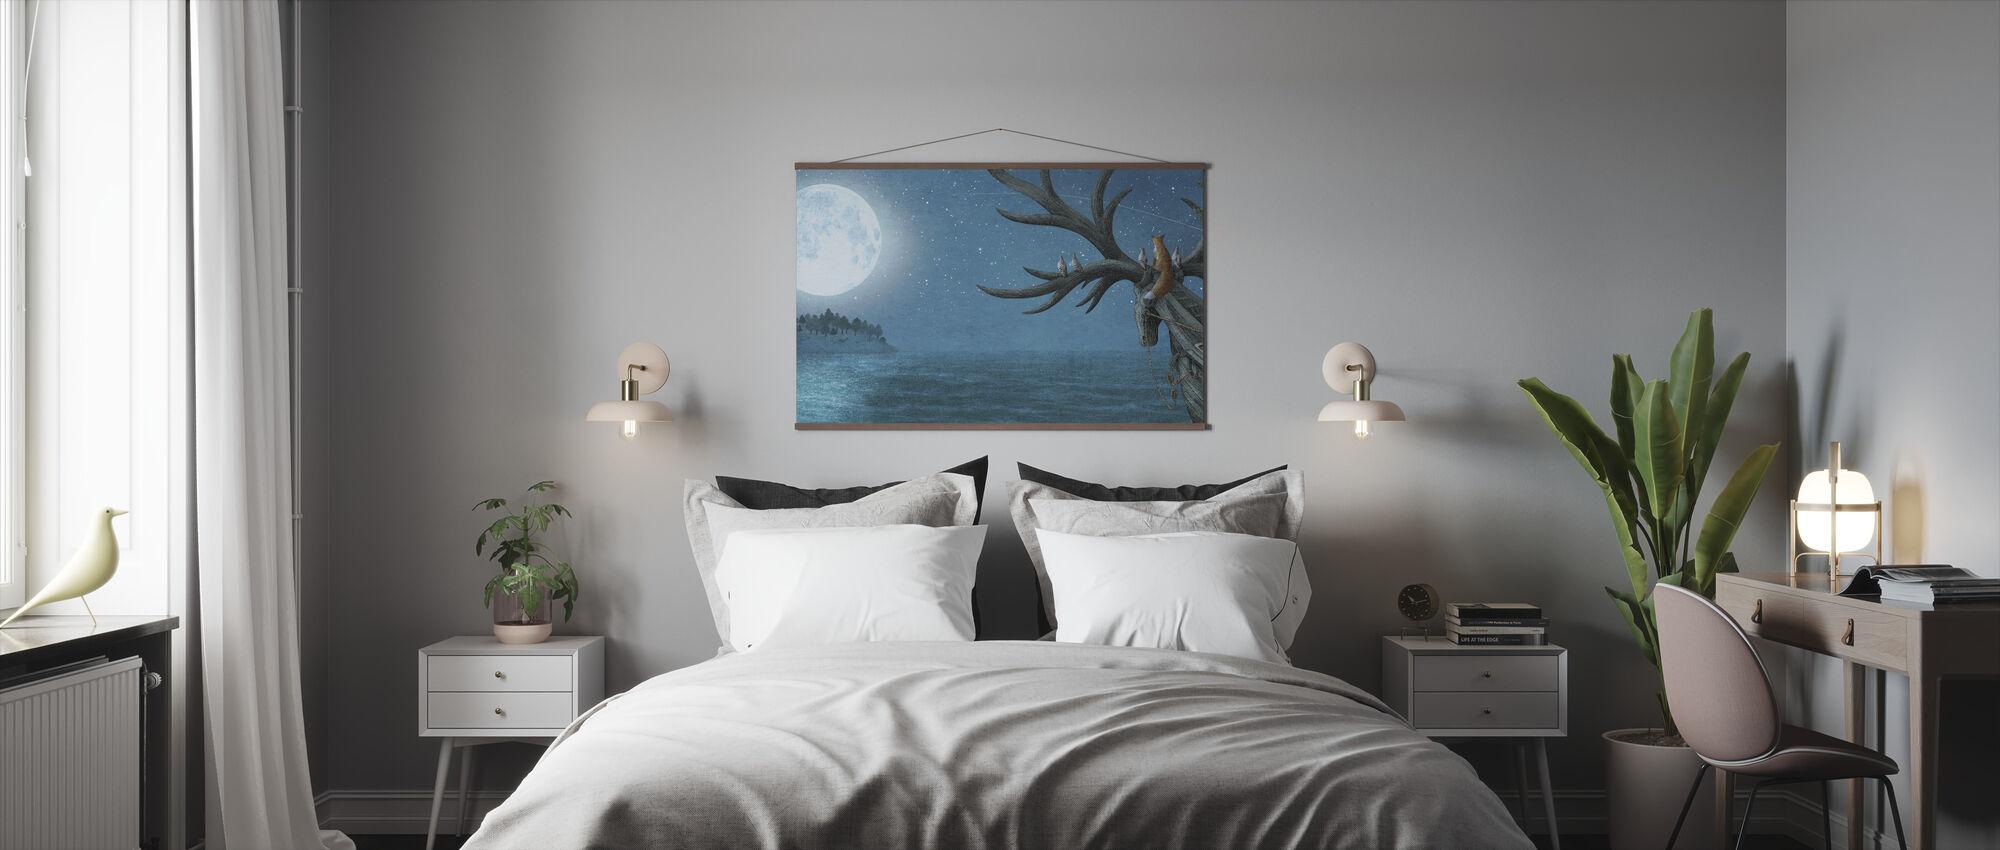 Antlered Ship Island Sighting - Poster - Bedroom